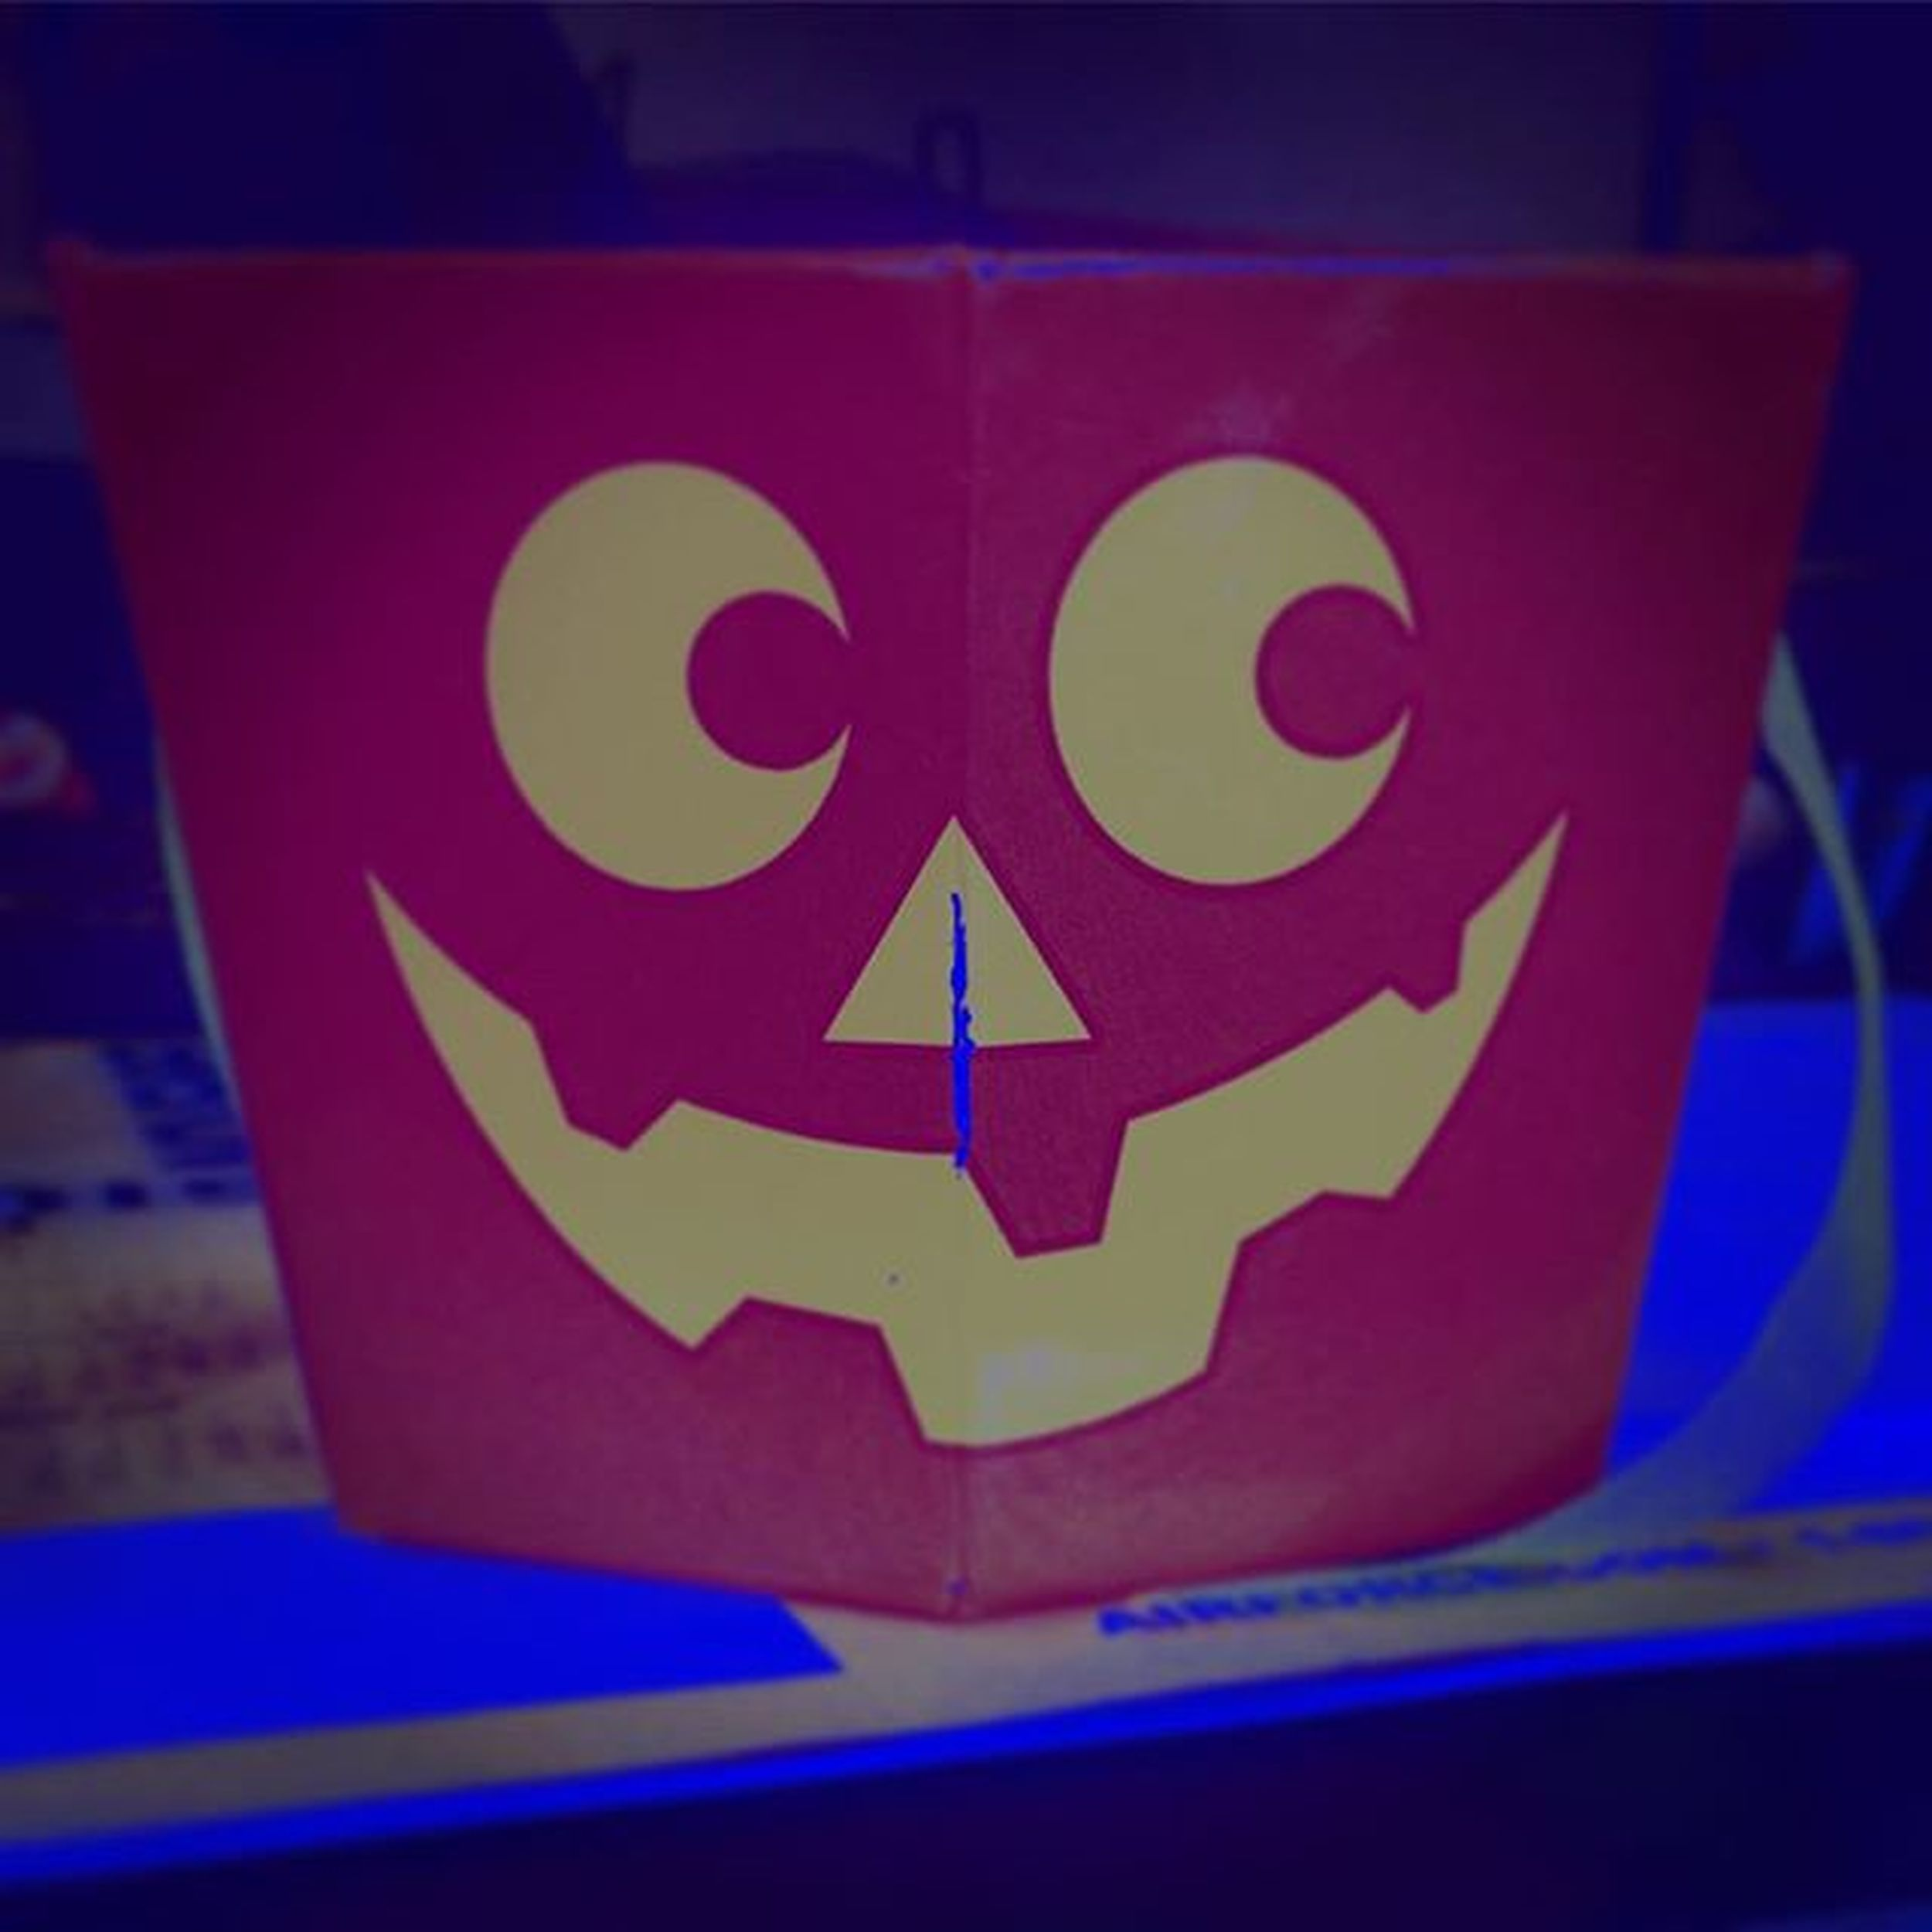 Spooky Halloweenisover Bummer Bummed Halloween Spooky Spoopy 2spoopy4u 2spooky4u 2spooky4you 2spoopy4me 2spoopy4you 2spooky4me Yikes Pumpkin Jackolantern Jackolanterns Cute